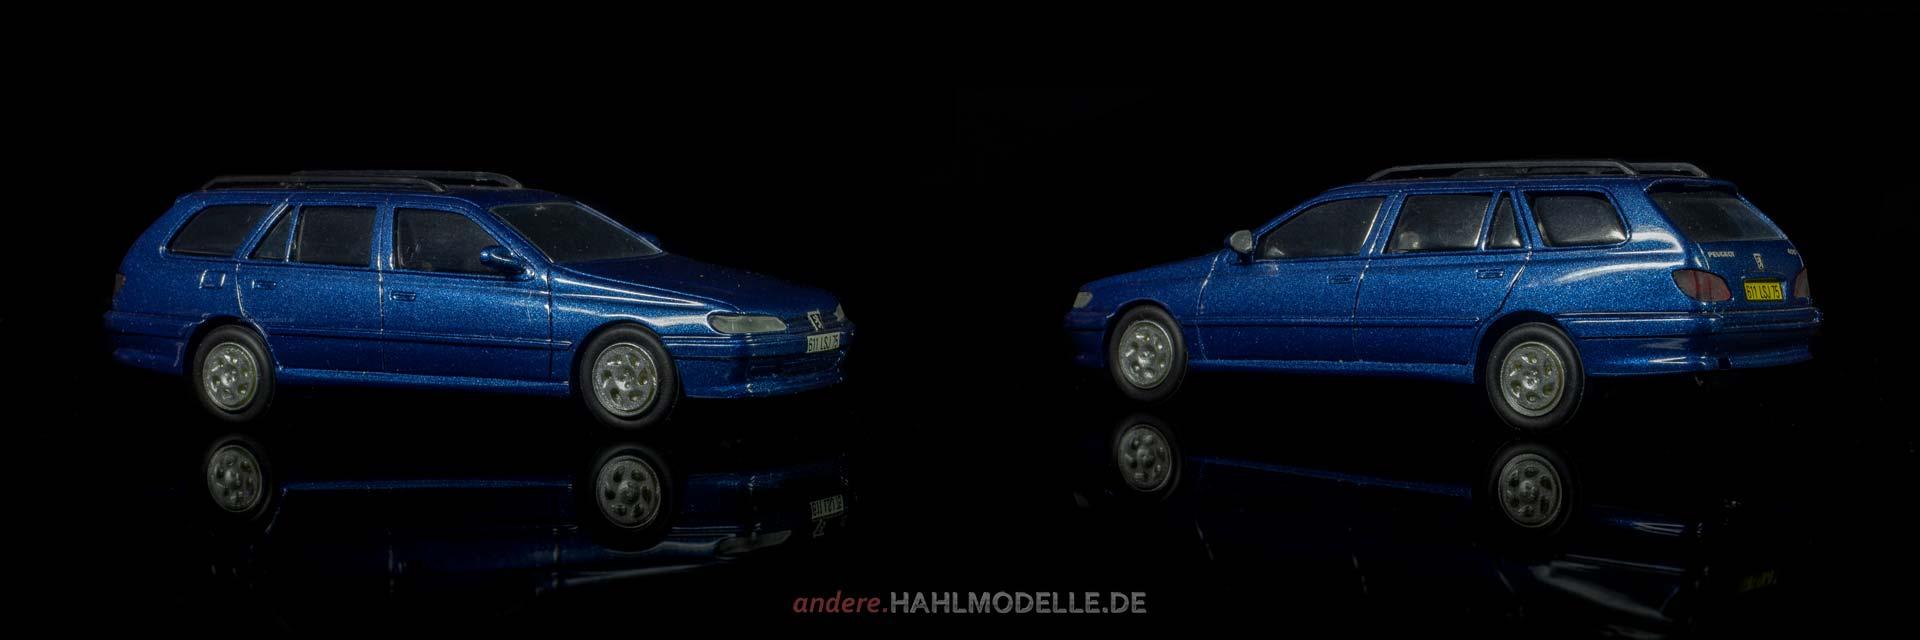 Peugeot 406 Break | Kombi | Paradcar | 1:43 | www.andere.hahlmodelle.de